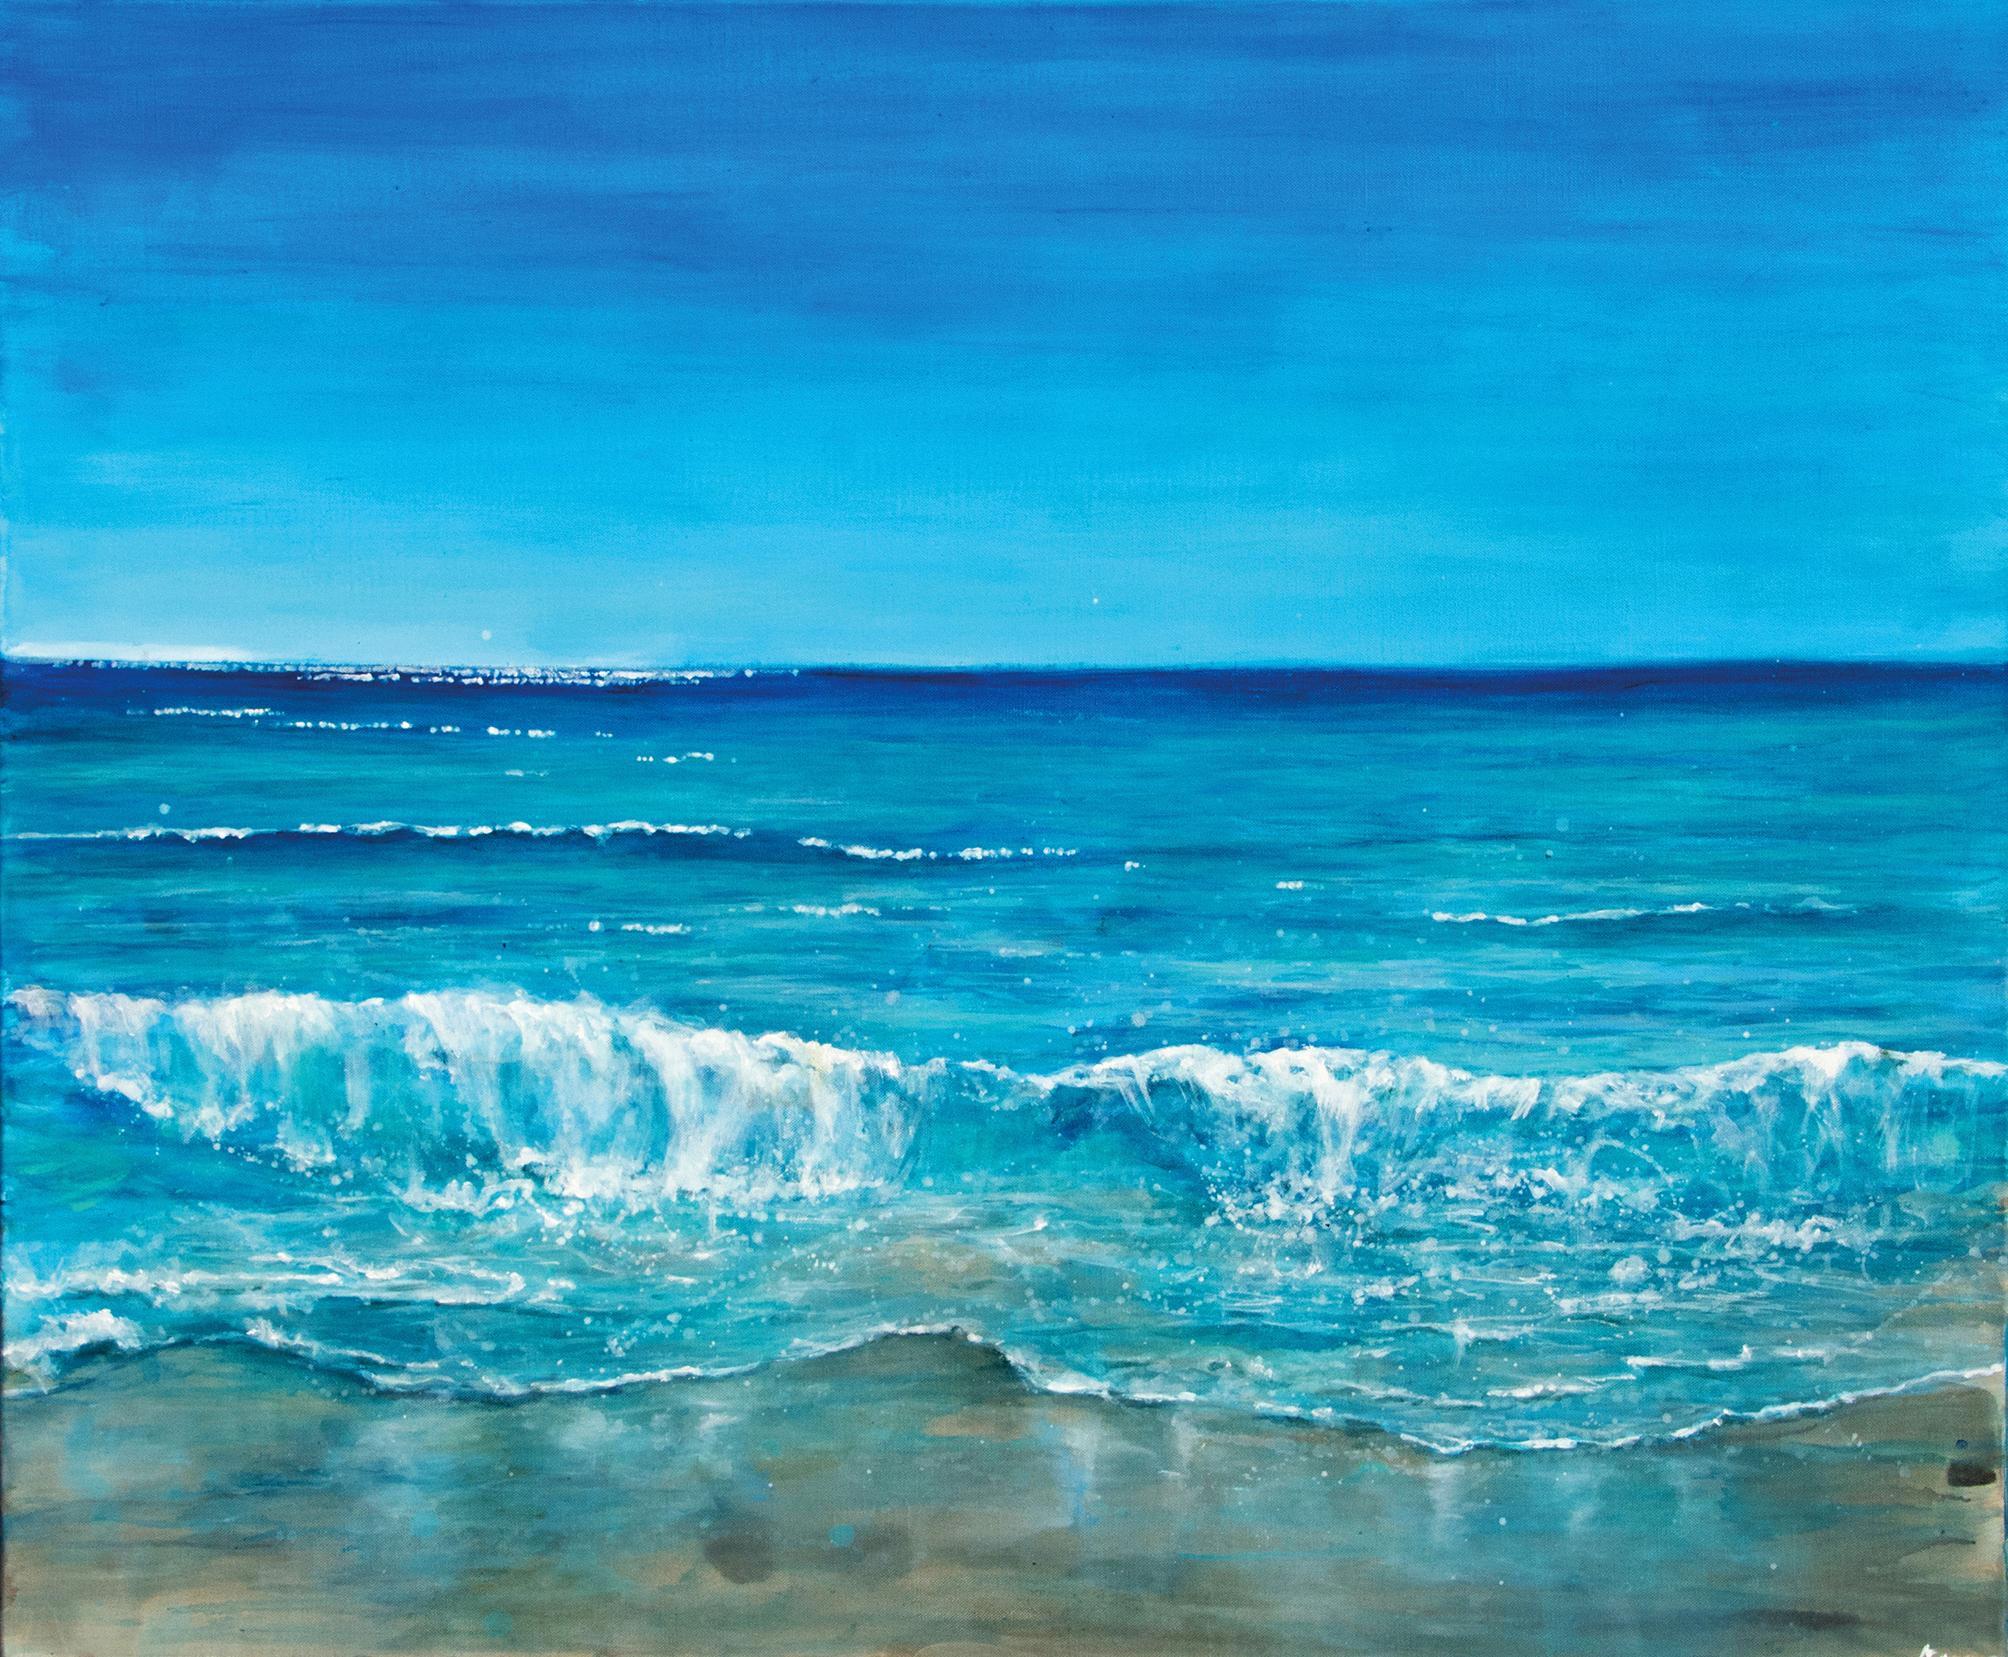 dans le bleu: mer et plage, 2018, Acryl auf Leinwand, 100 x 120 cm